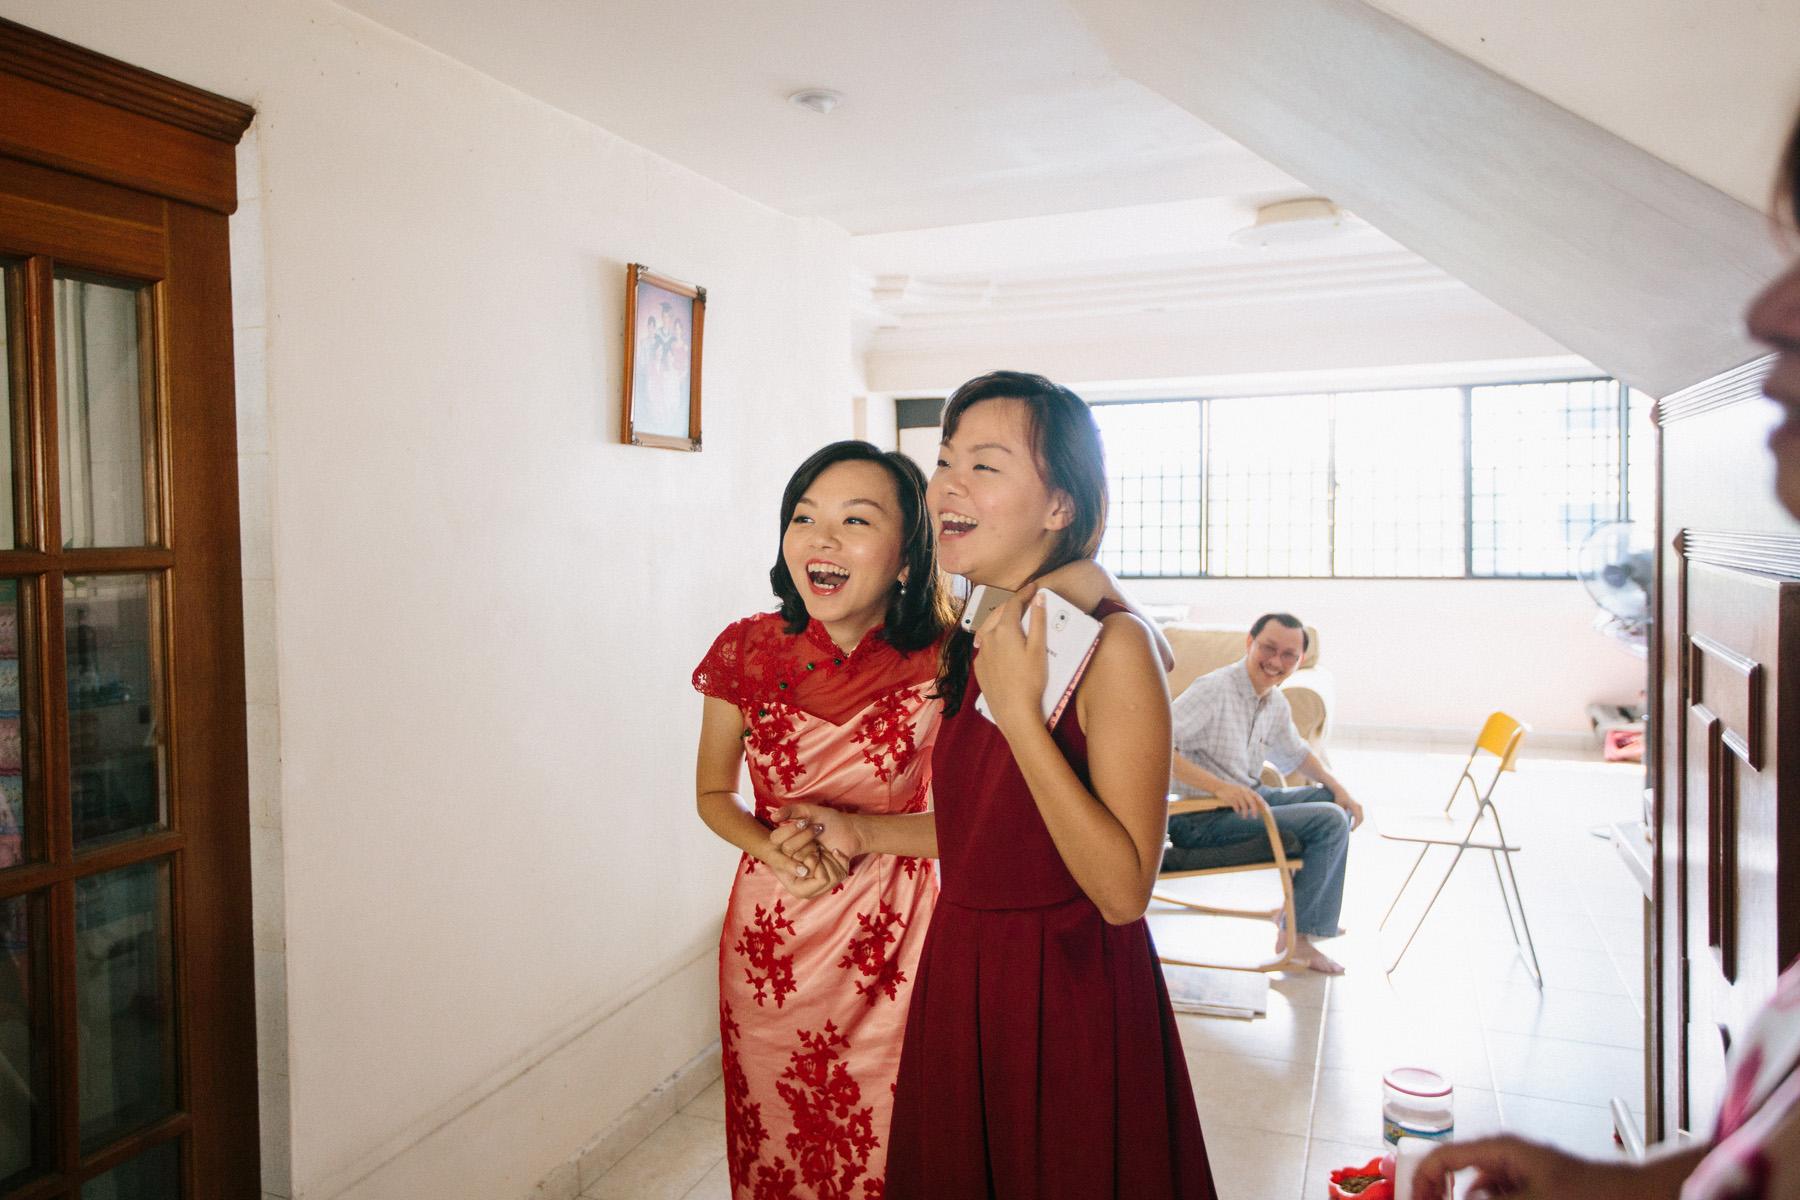 singapore-wedding-travel-photographer-faith-alvin-wedding-wmt-11.jpg